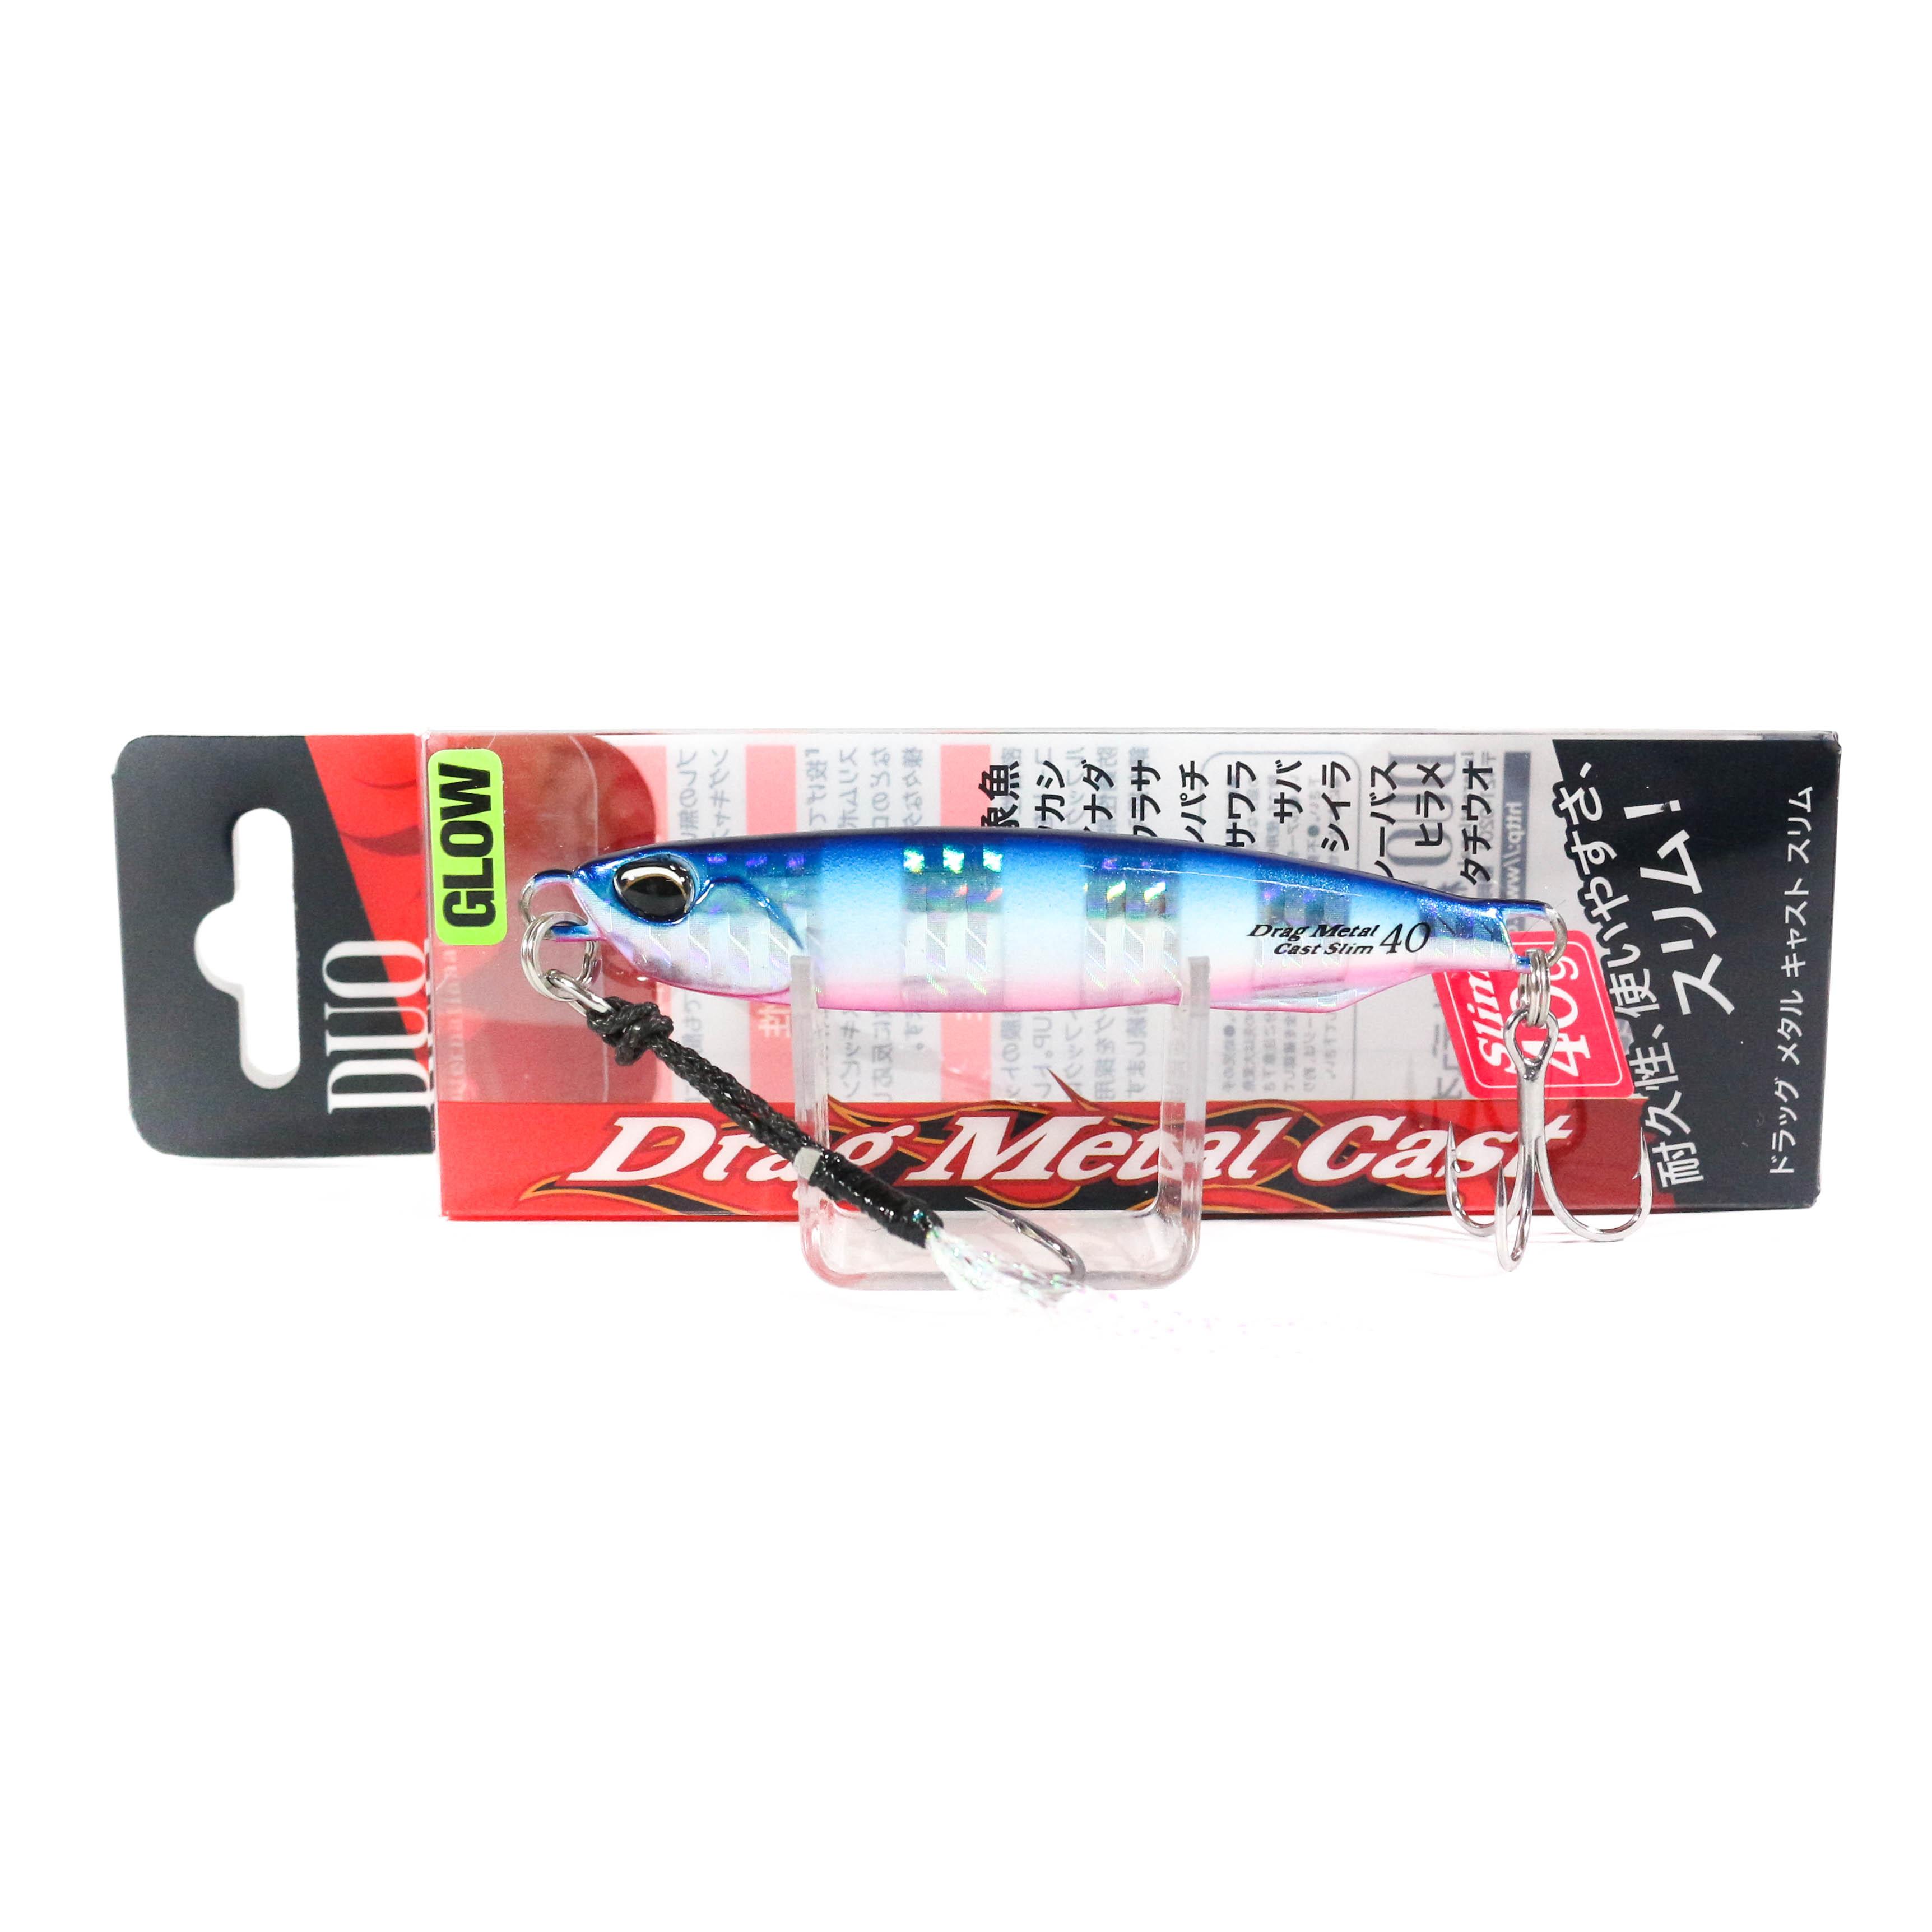 Duo Metal Jig Drag Metal Cast Slim 60 grams PCC0439 0009